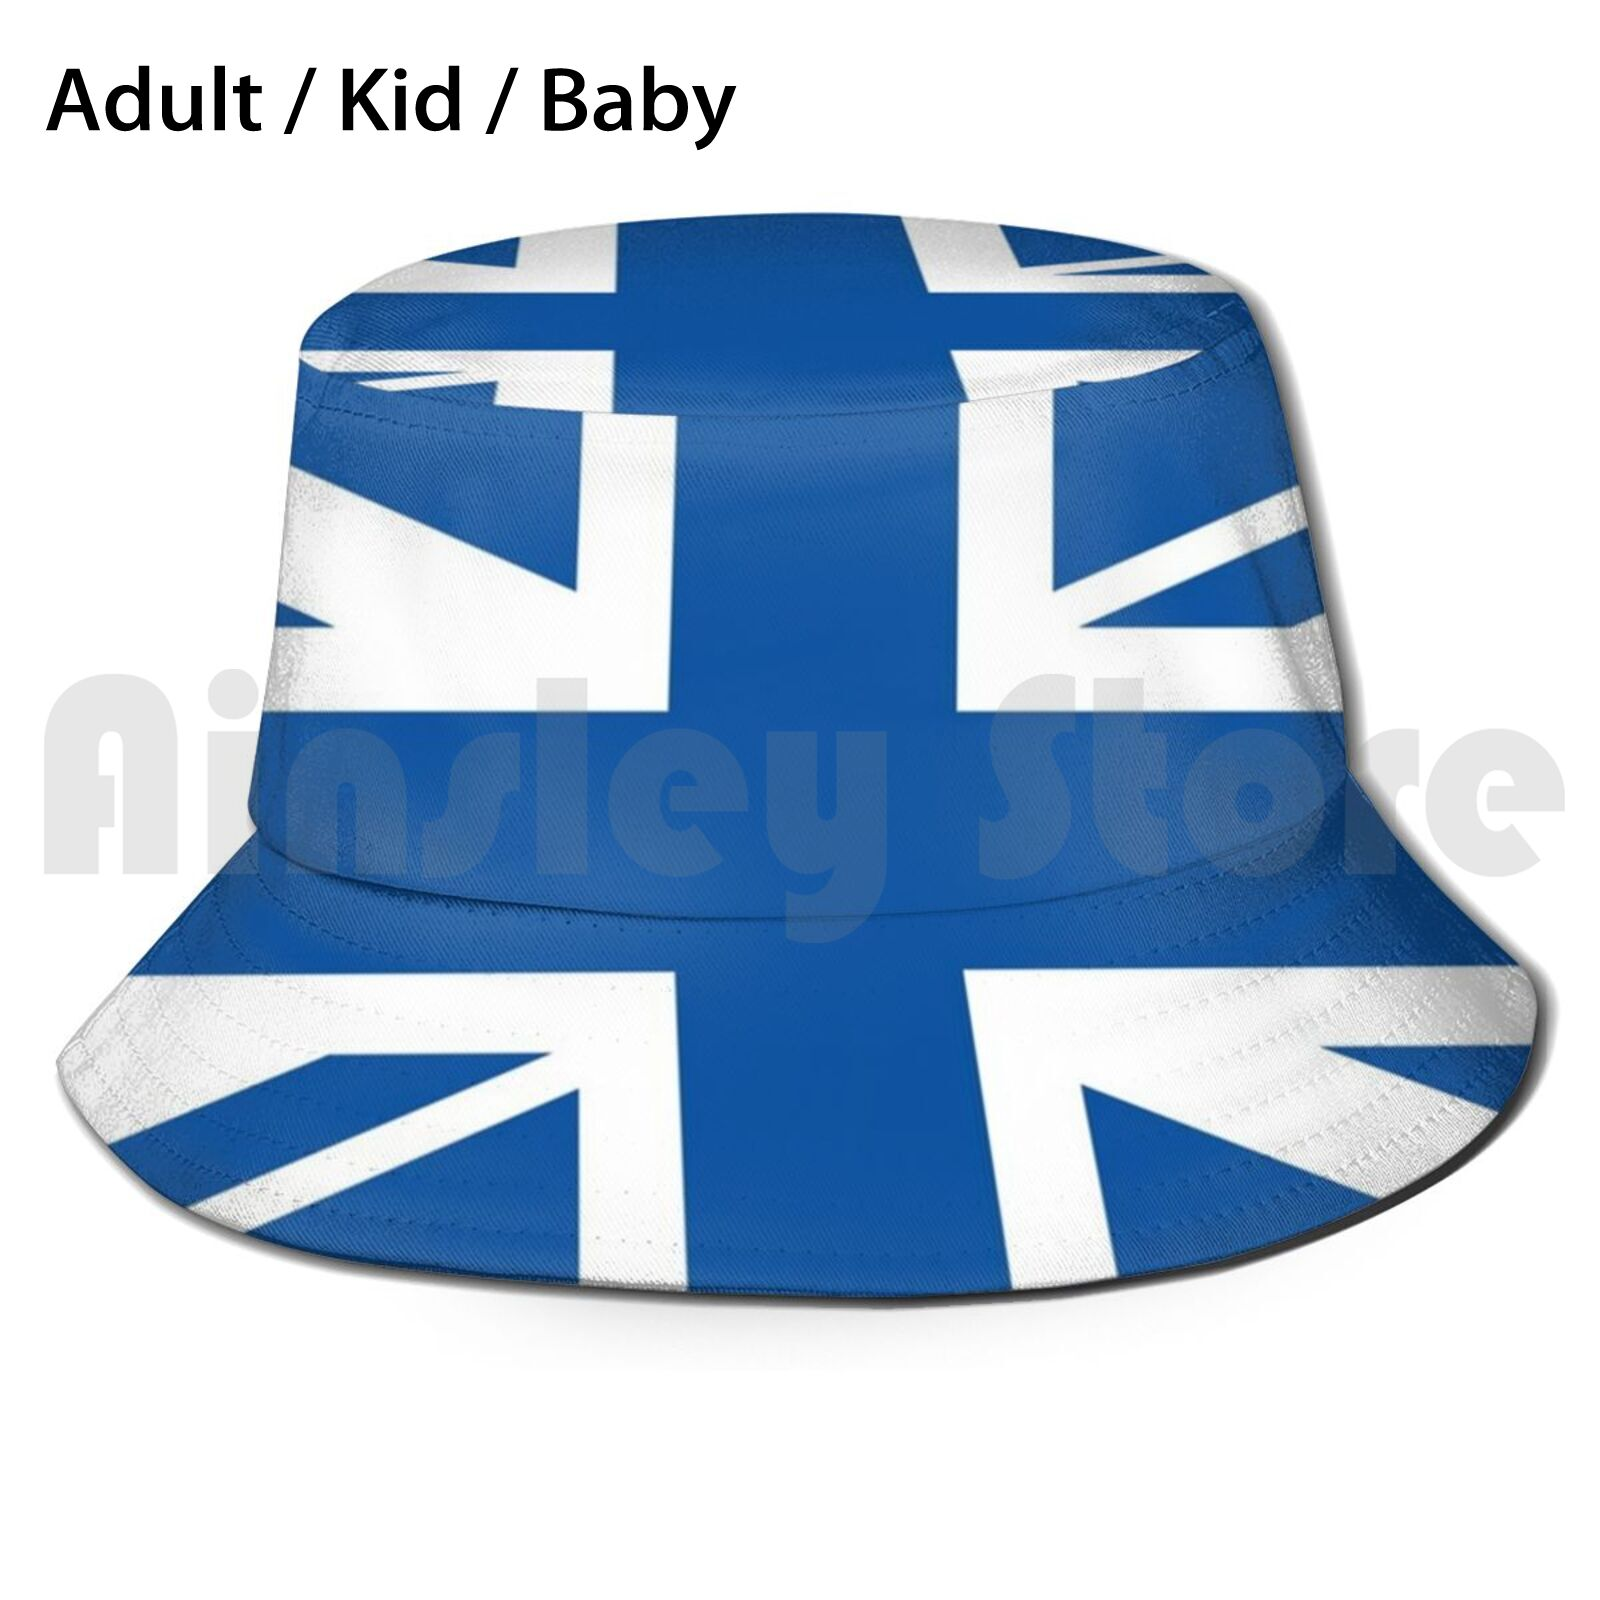 Blue & White Union Jack Flag Bucket Hat Adult kid baby Beach Sun Hats Union Jack Uk Flag Everton Leicester City Glasgow